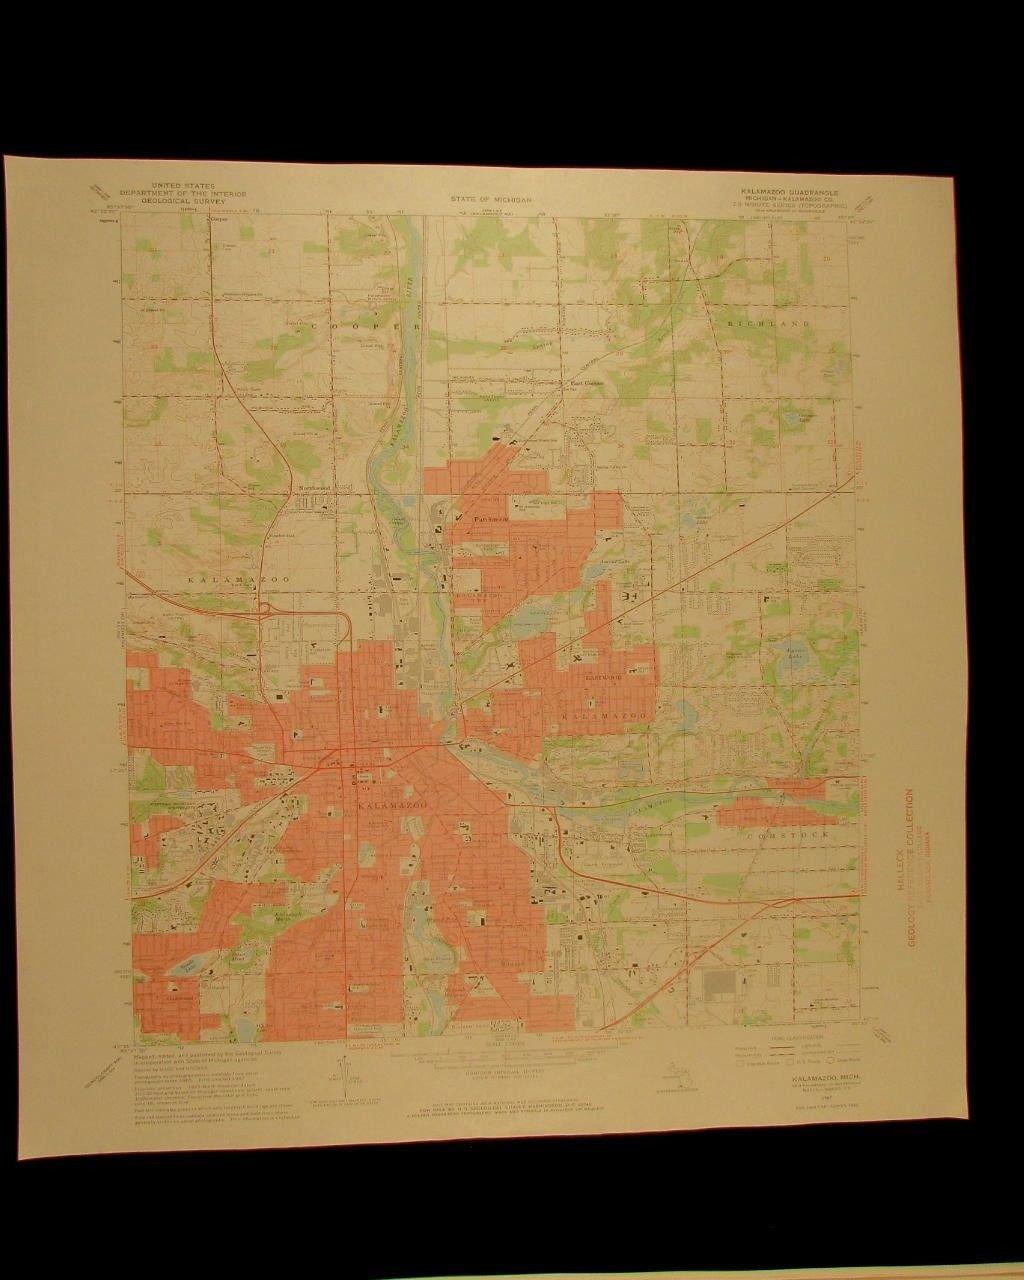 Amazon.com: Kalamazoo Michigan vintage 1969 downtown USGS ... on new orleans louisiana state map, kalamazoo mi zip codes by state, calabasas california state map, des moines iowa state map, biloxi mississippi state map, kearney nebraska state map, concord new hampshire state map, eugene oregon state map, alhambra california state map, glendive montana state map, charleston south carolina state map, kalamazoo road map, richmond virginia state map, savannah georgia state map, peoria illinois state map, kalamazoo mi map, kalamazoo michigan people, oakland california state map, kalamazoo wmu campus map, san diego california state map,